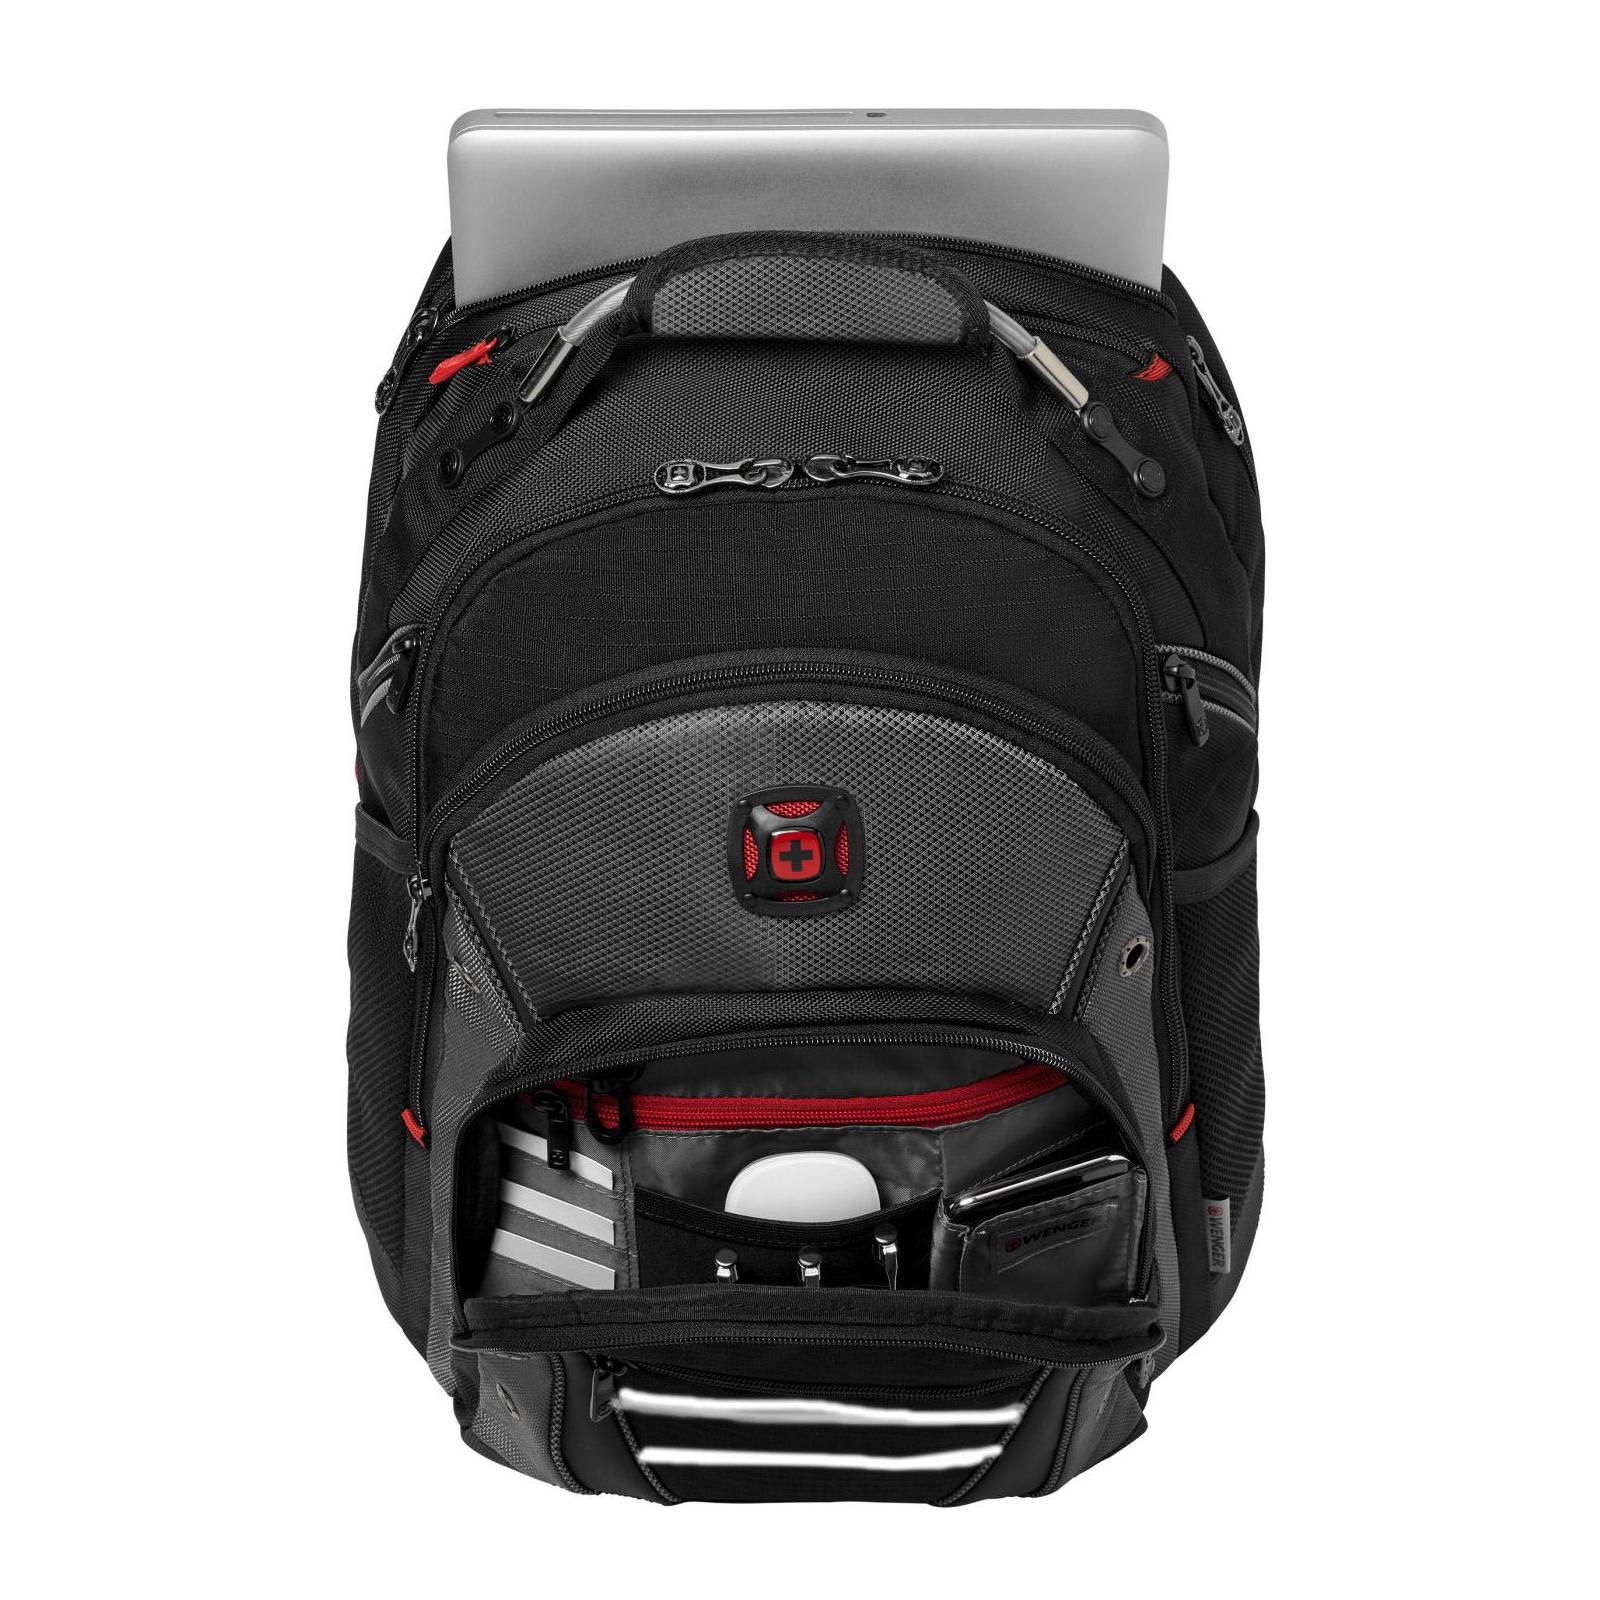 "Рюкзак для ноутбука Wenger 16"" Synergy Black/Gray (600635) изображение 5"